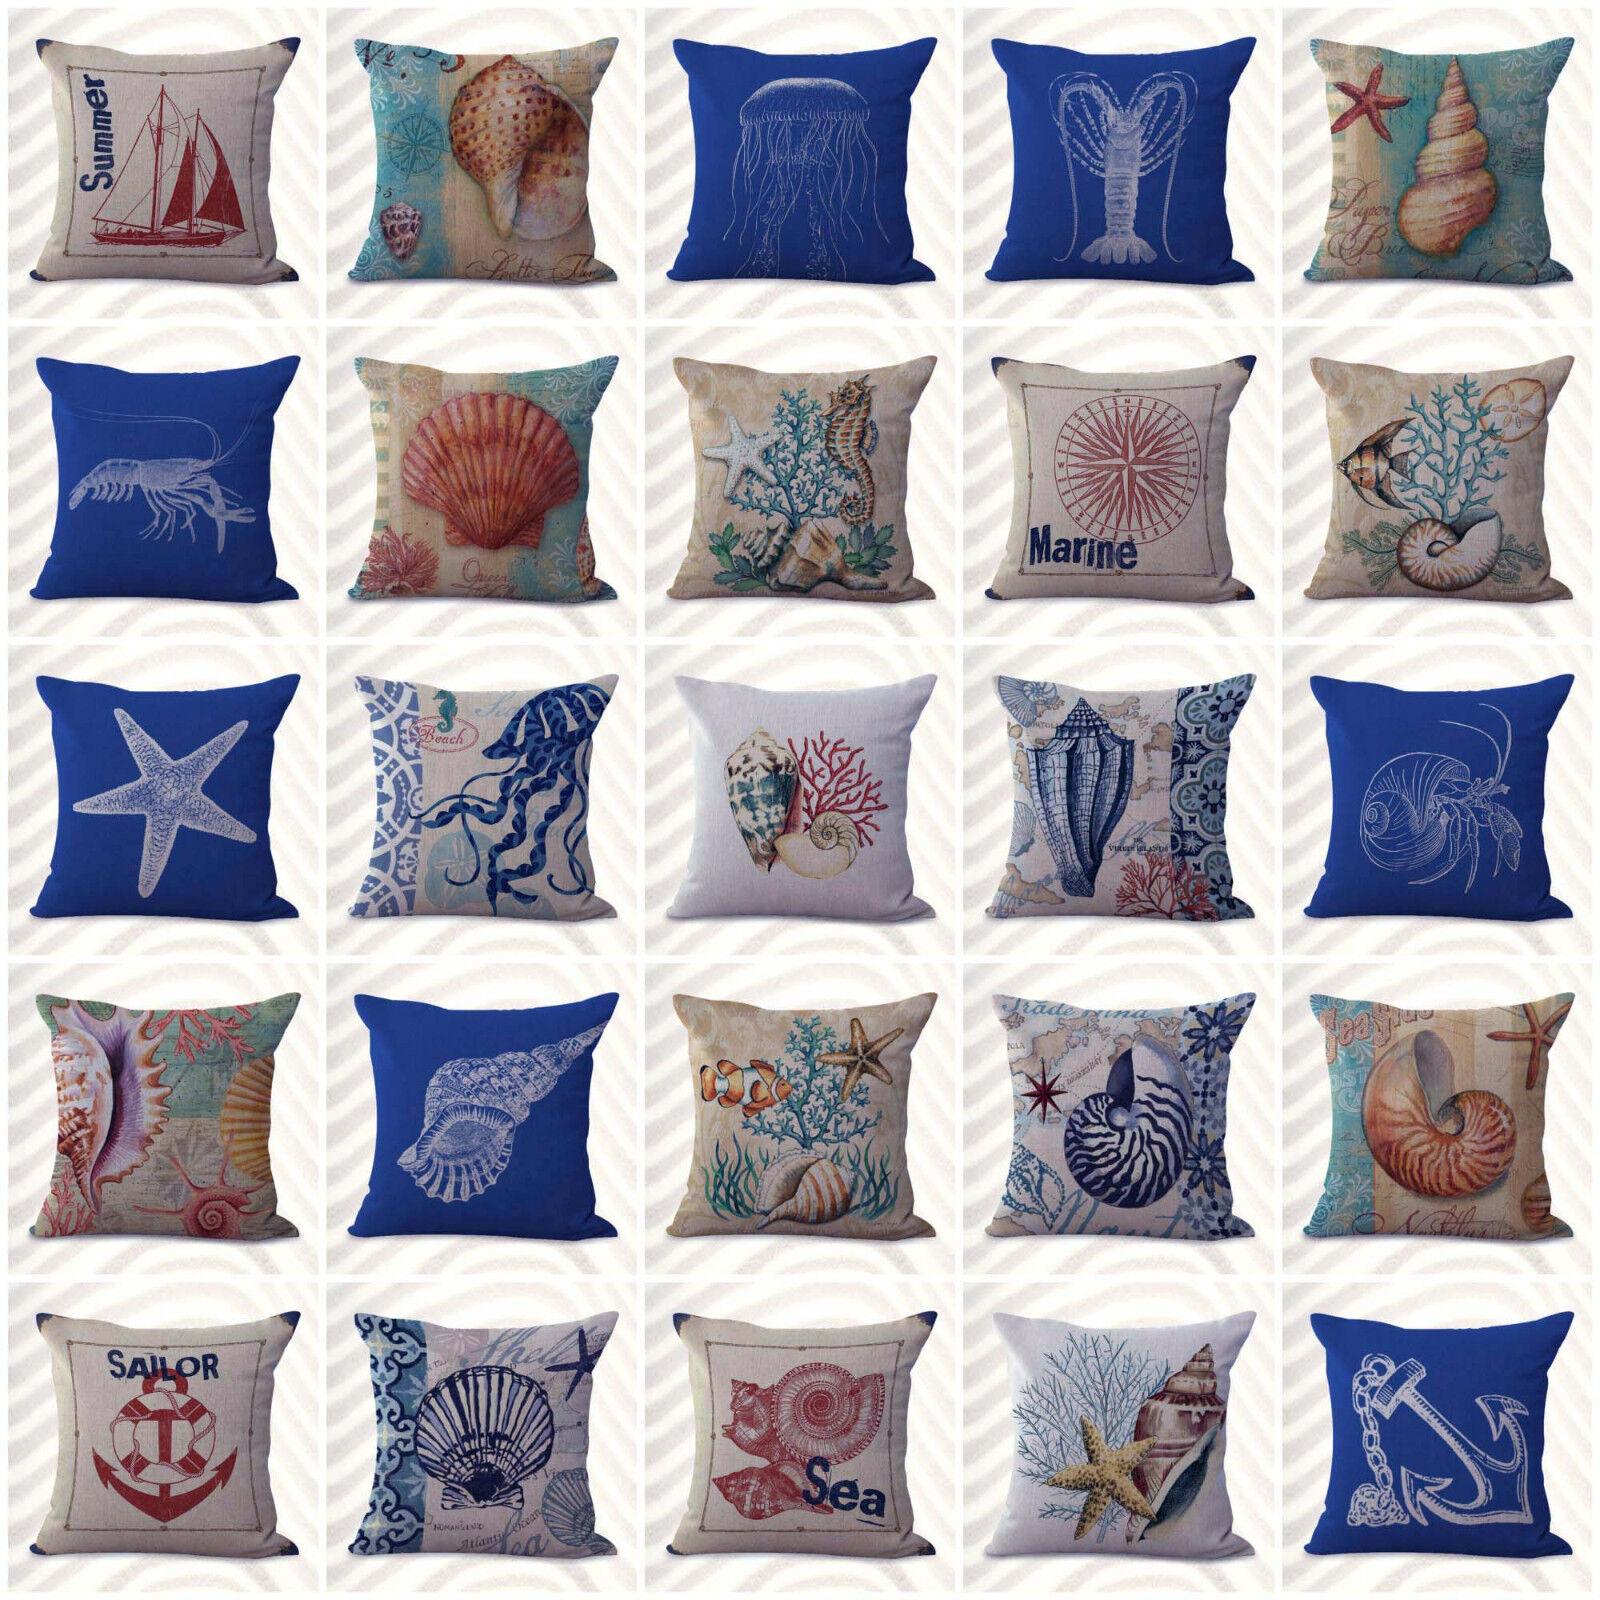 US Seller- 20pcs cushion covers shells seahorse turtle nautical patio furniture